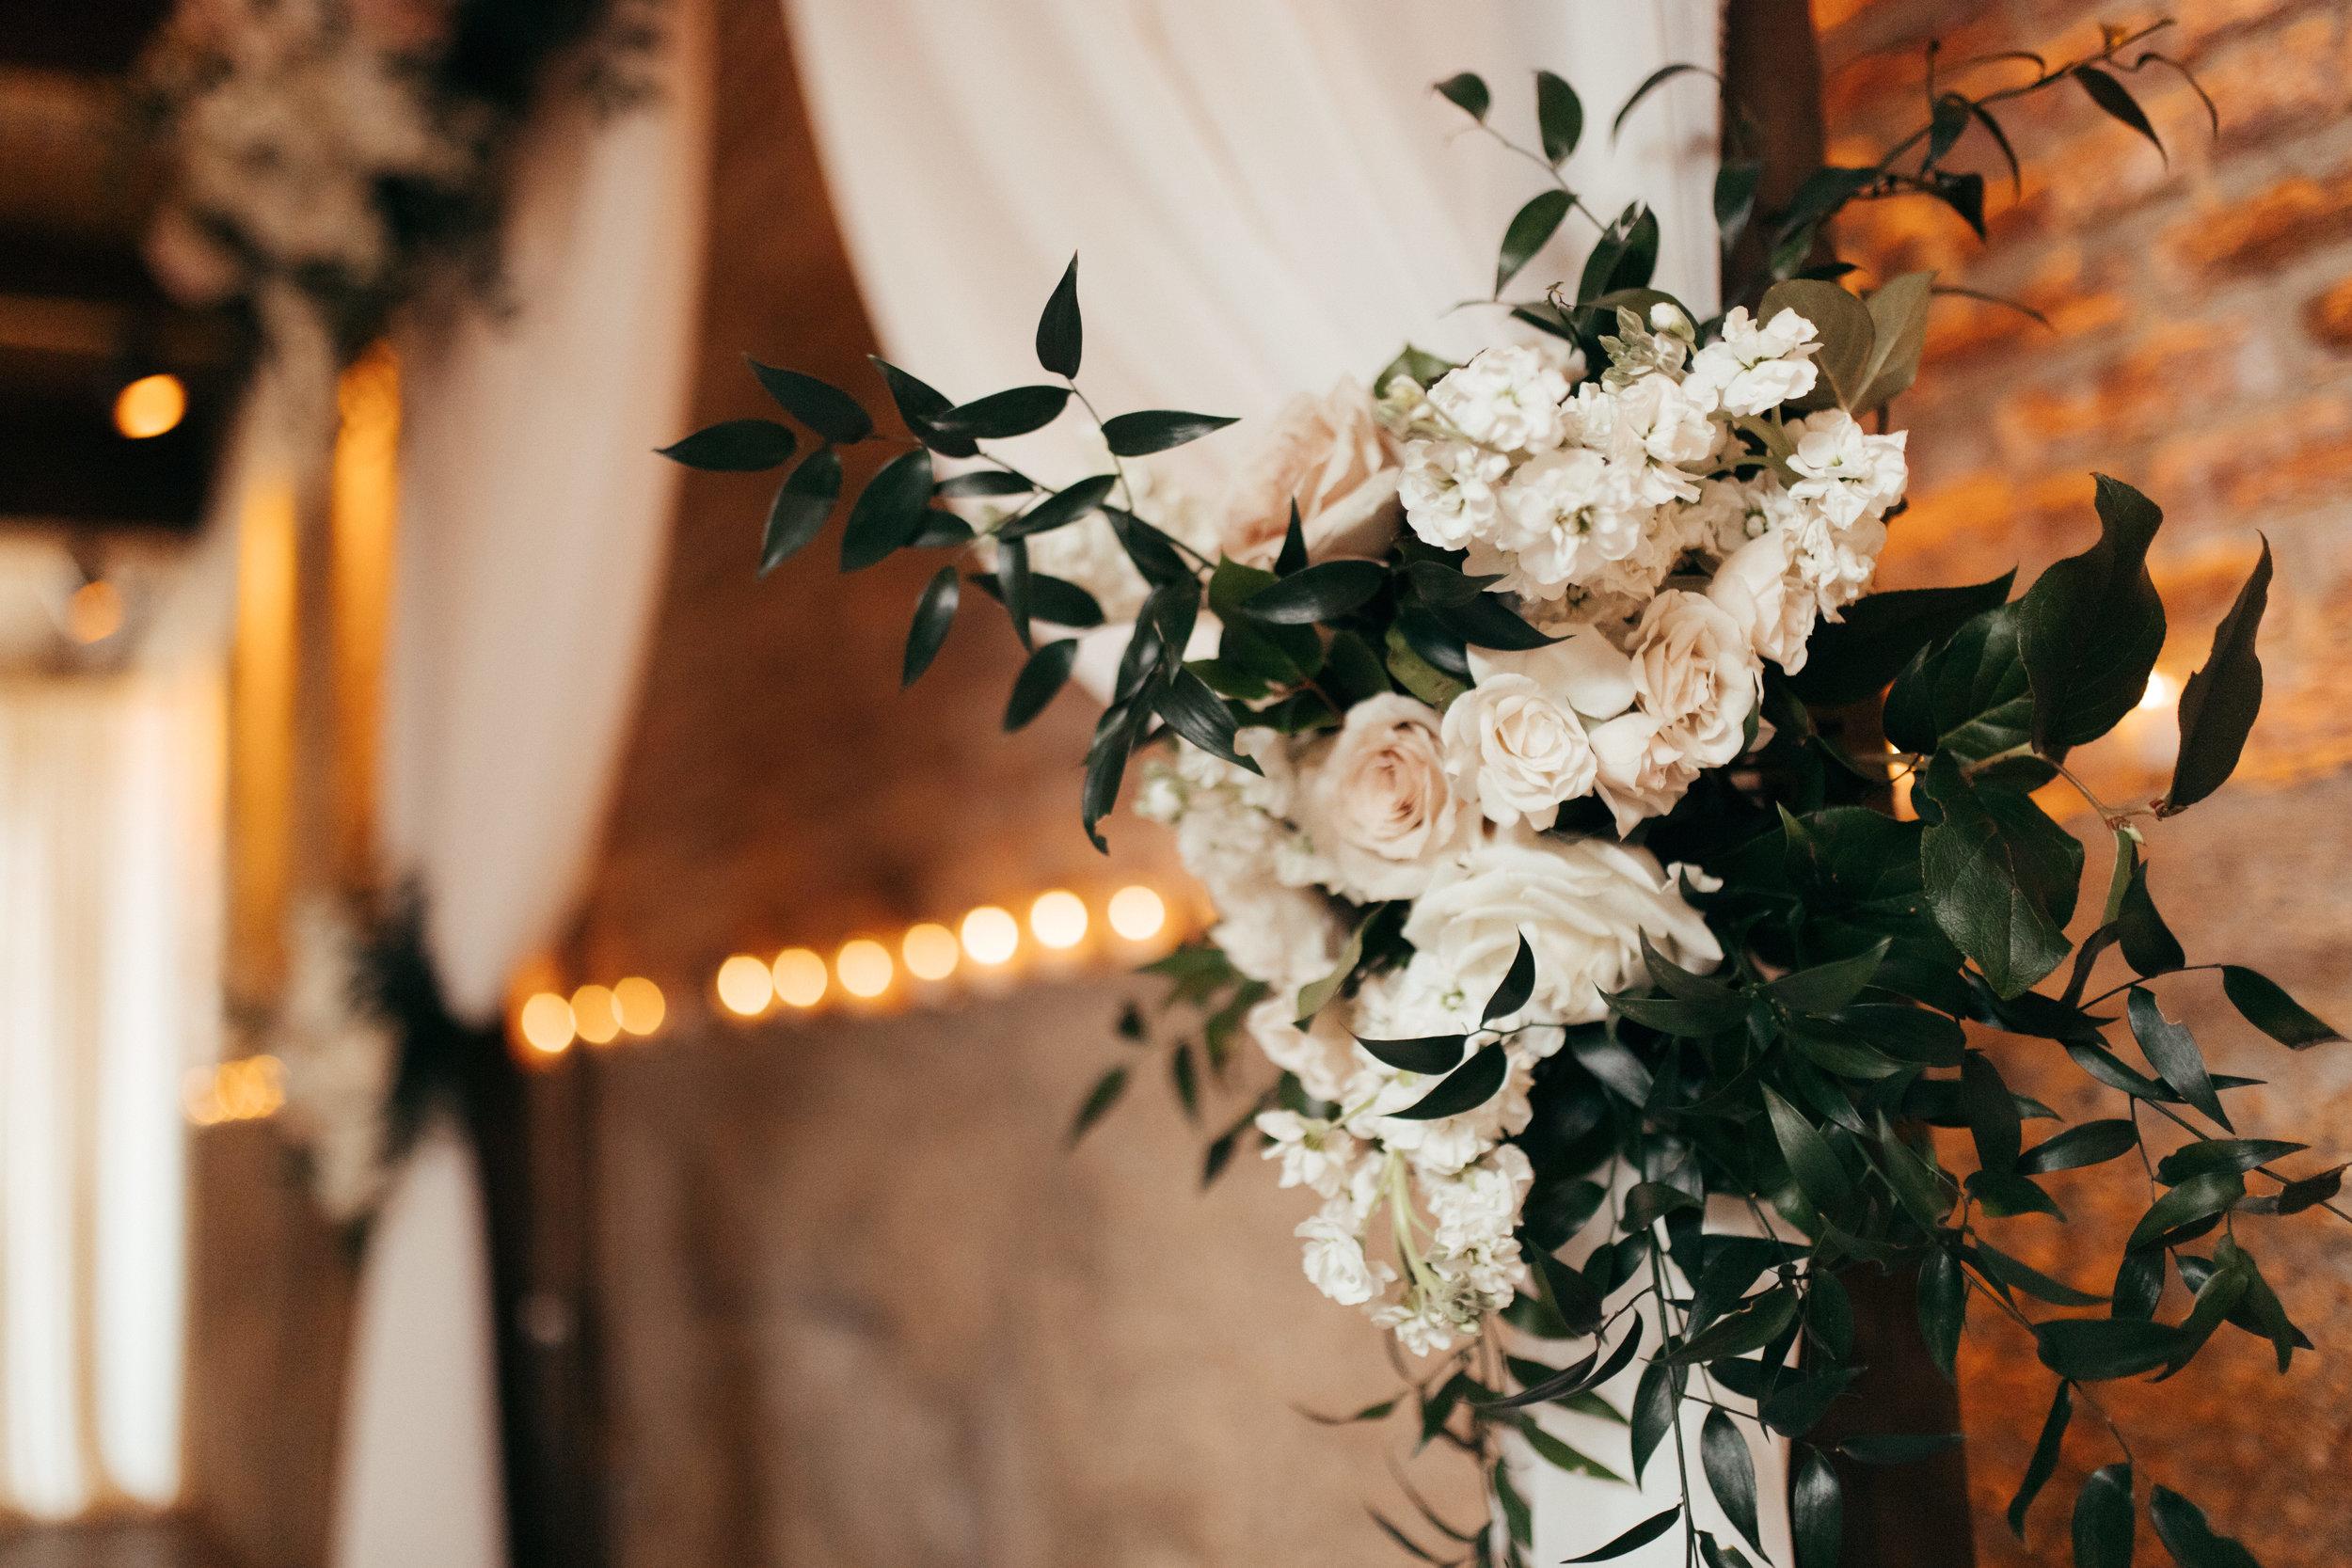 Mindy&Jared-wedding-by-LadiesAndGentlemen-by-Matija-Vuri-3245.jpg